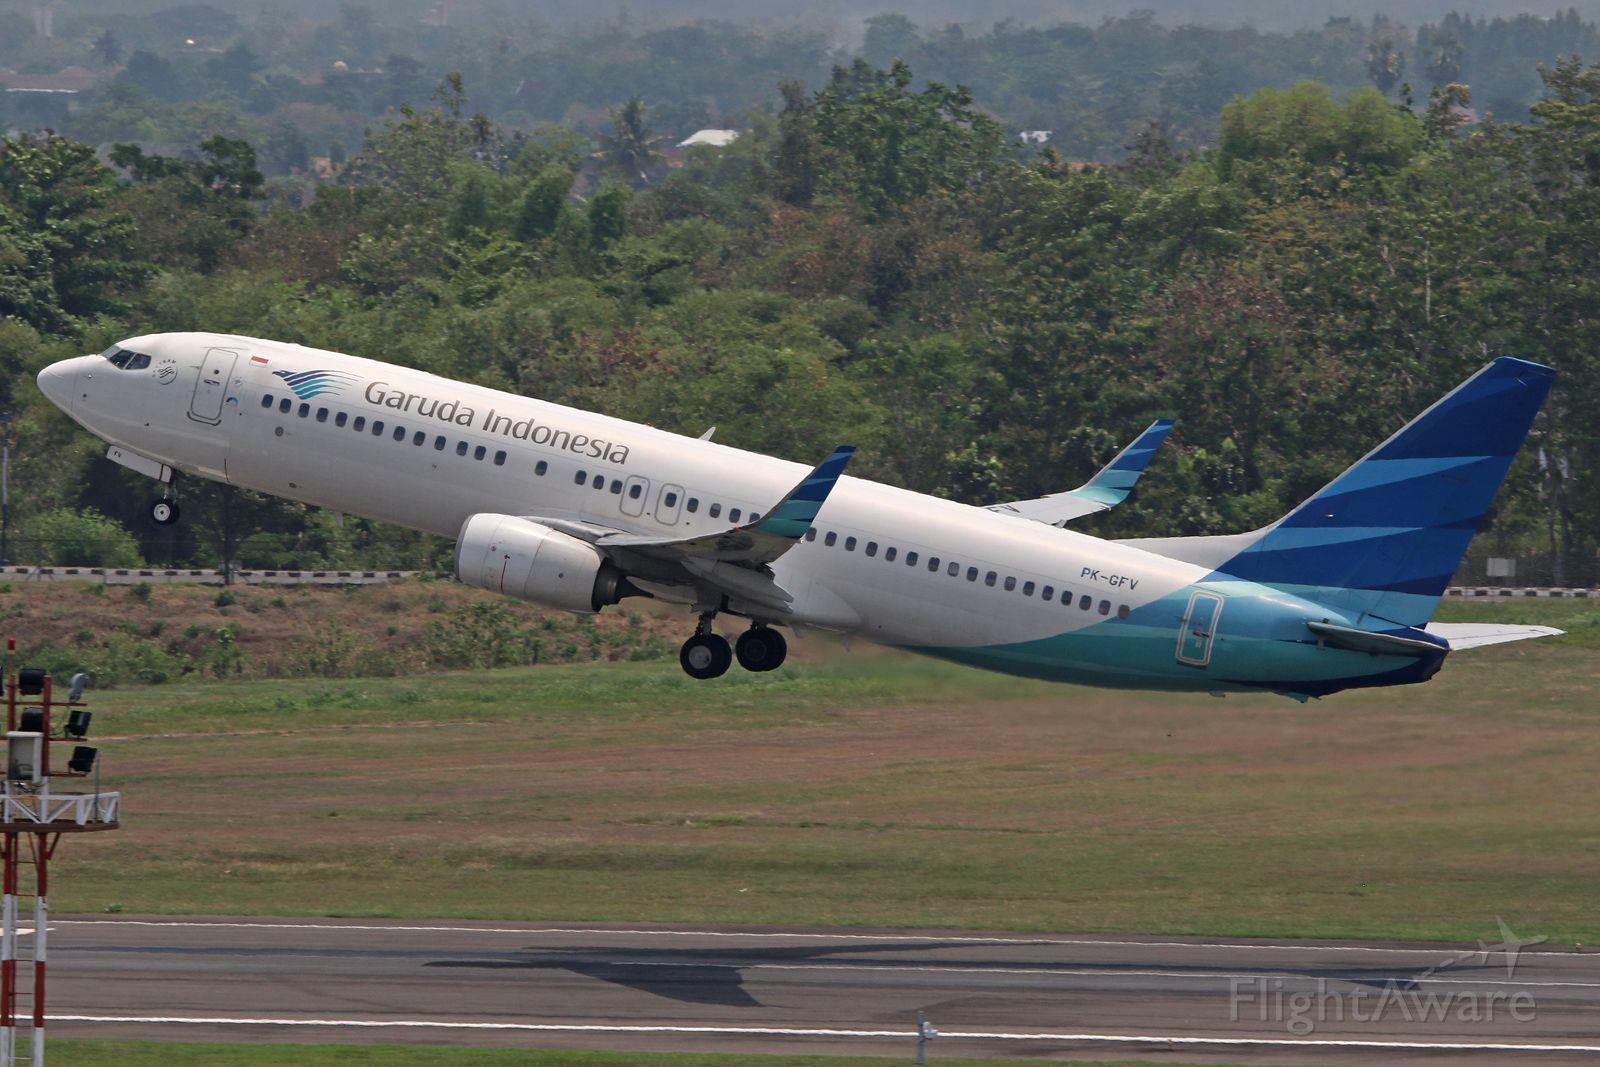 Boeing 737-700 (PK-GFV)